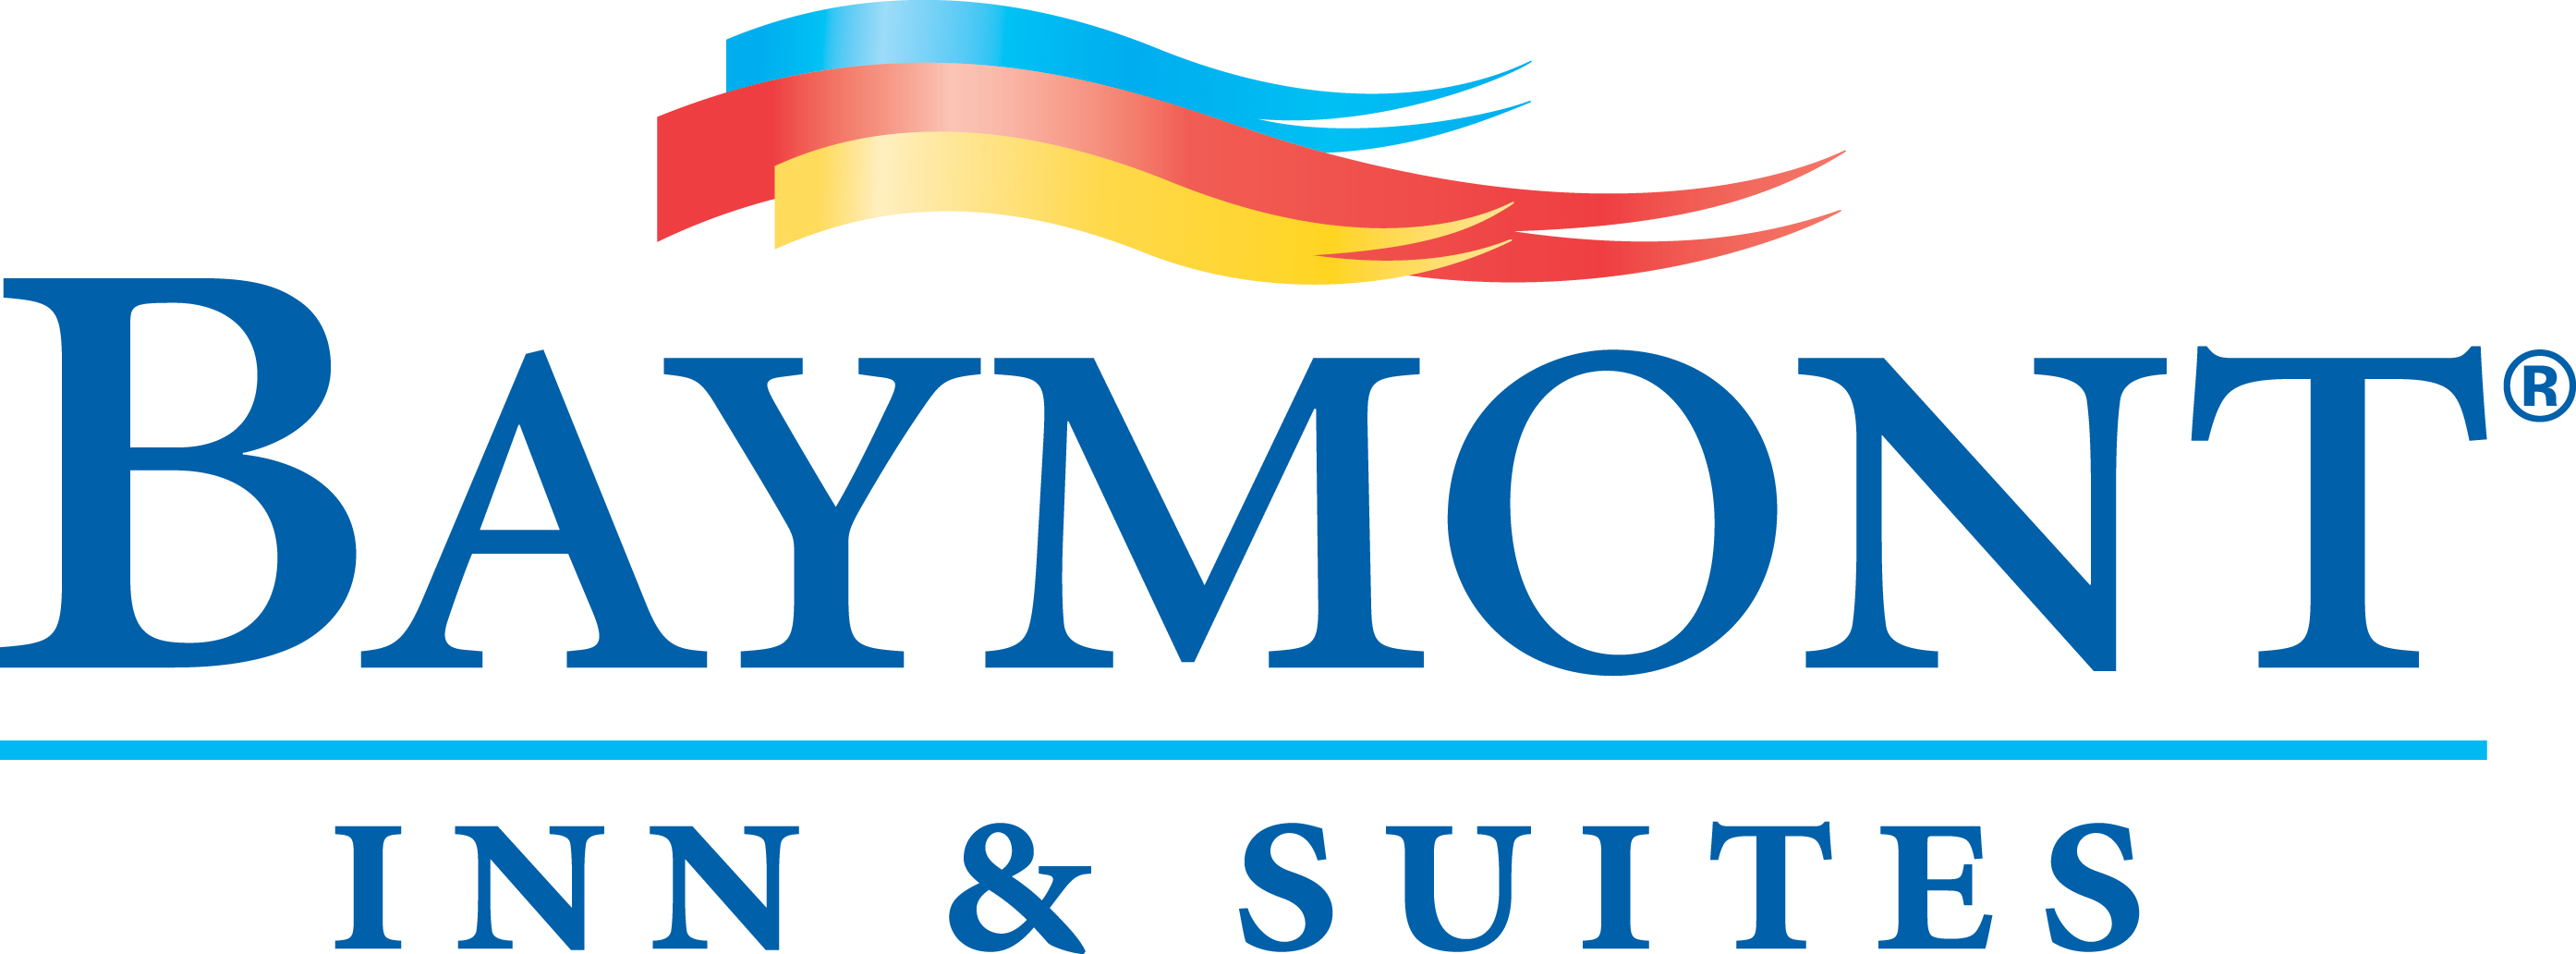 Baymont Inn & Suites, Springfield Il